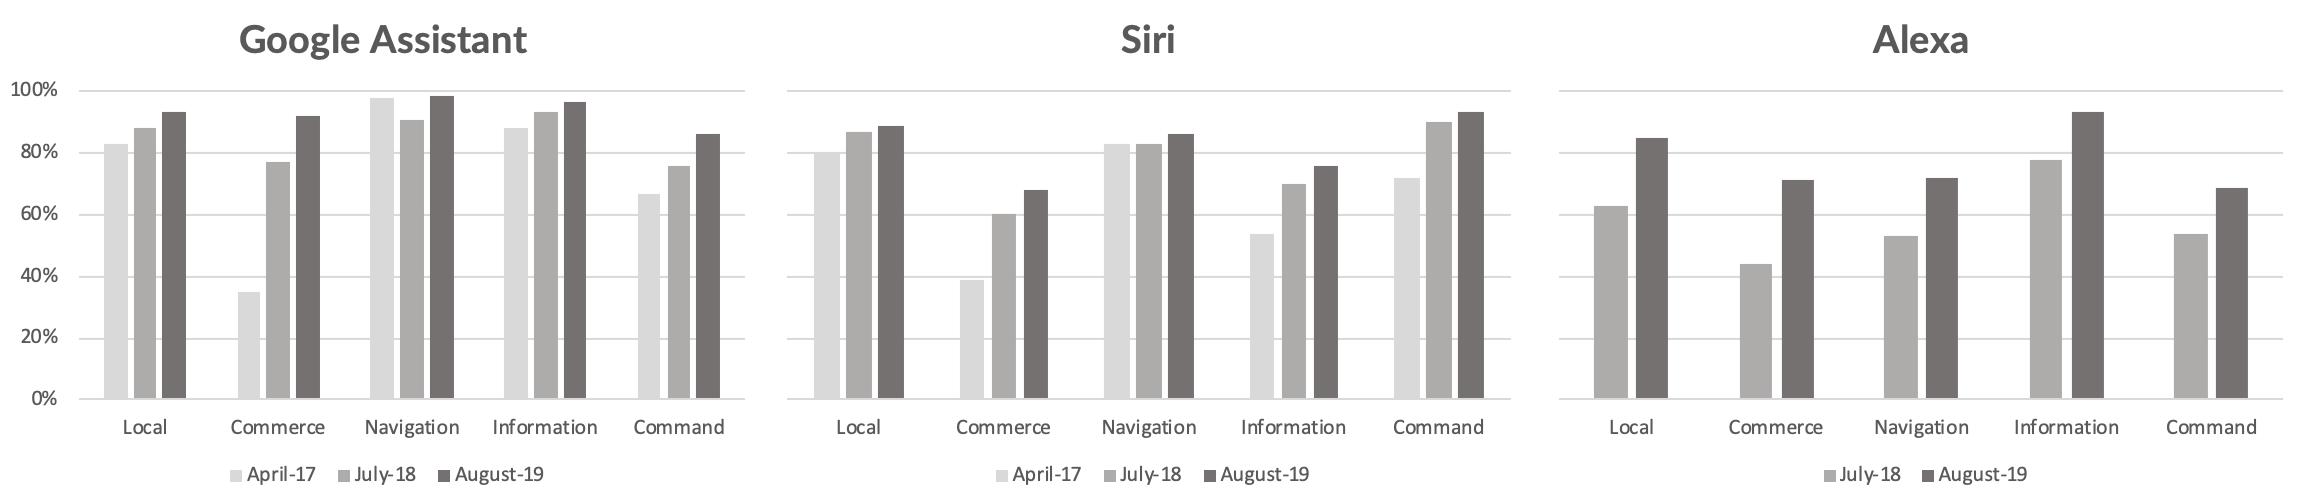 Google Assistant Bietet Siri und Alexa Smart Assistant mit höchstem IQ 1